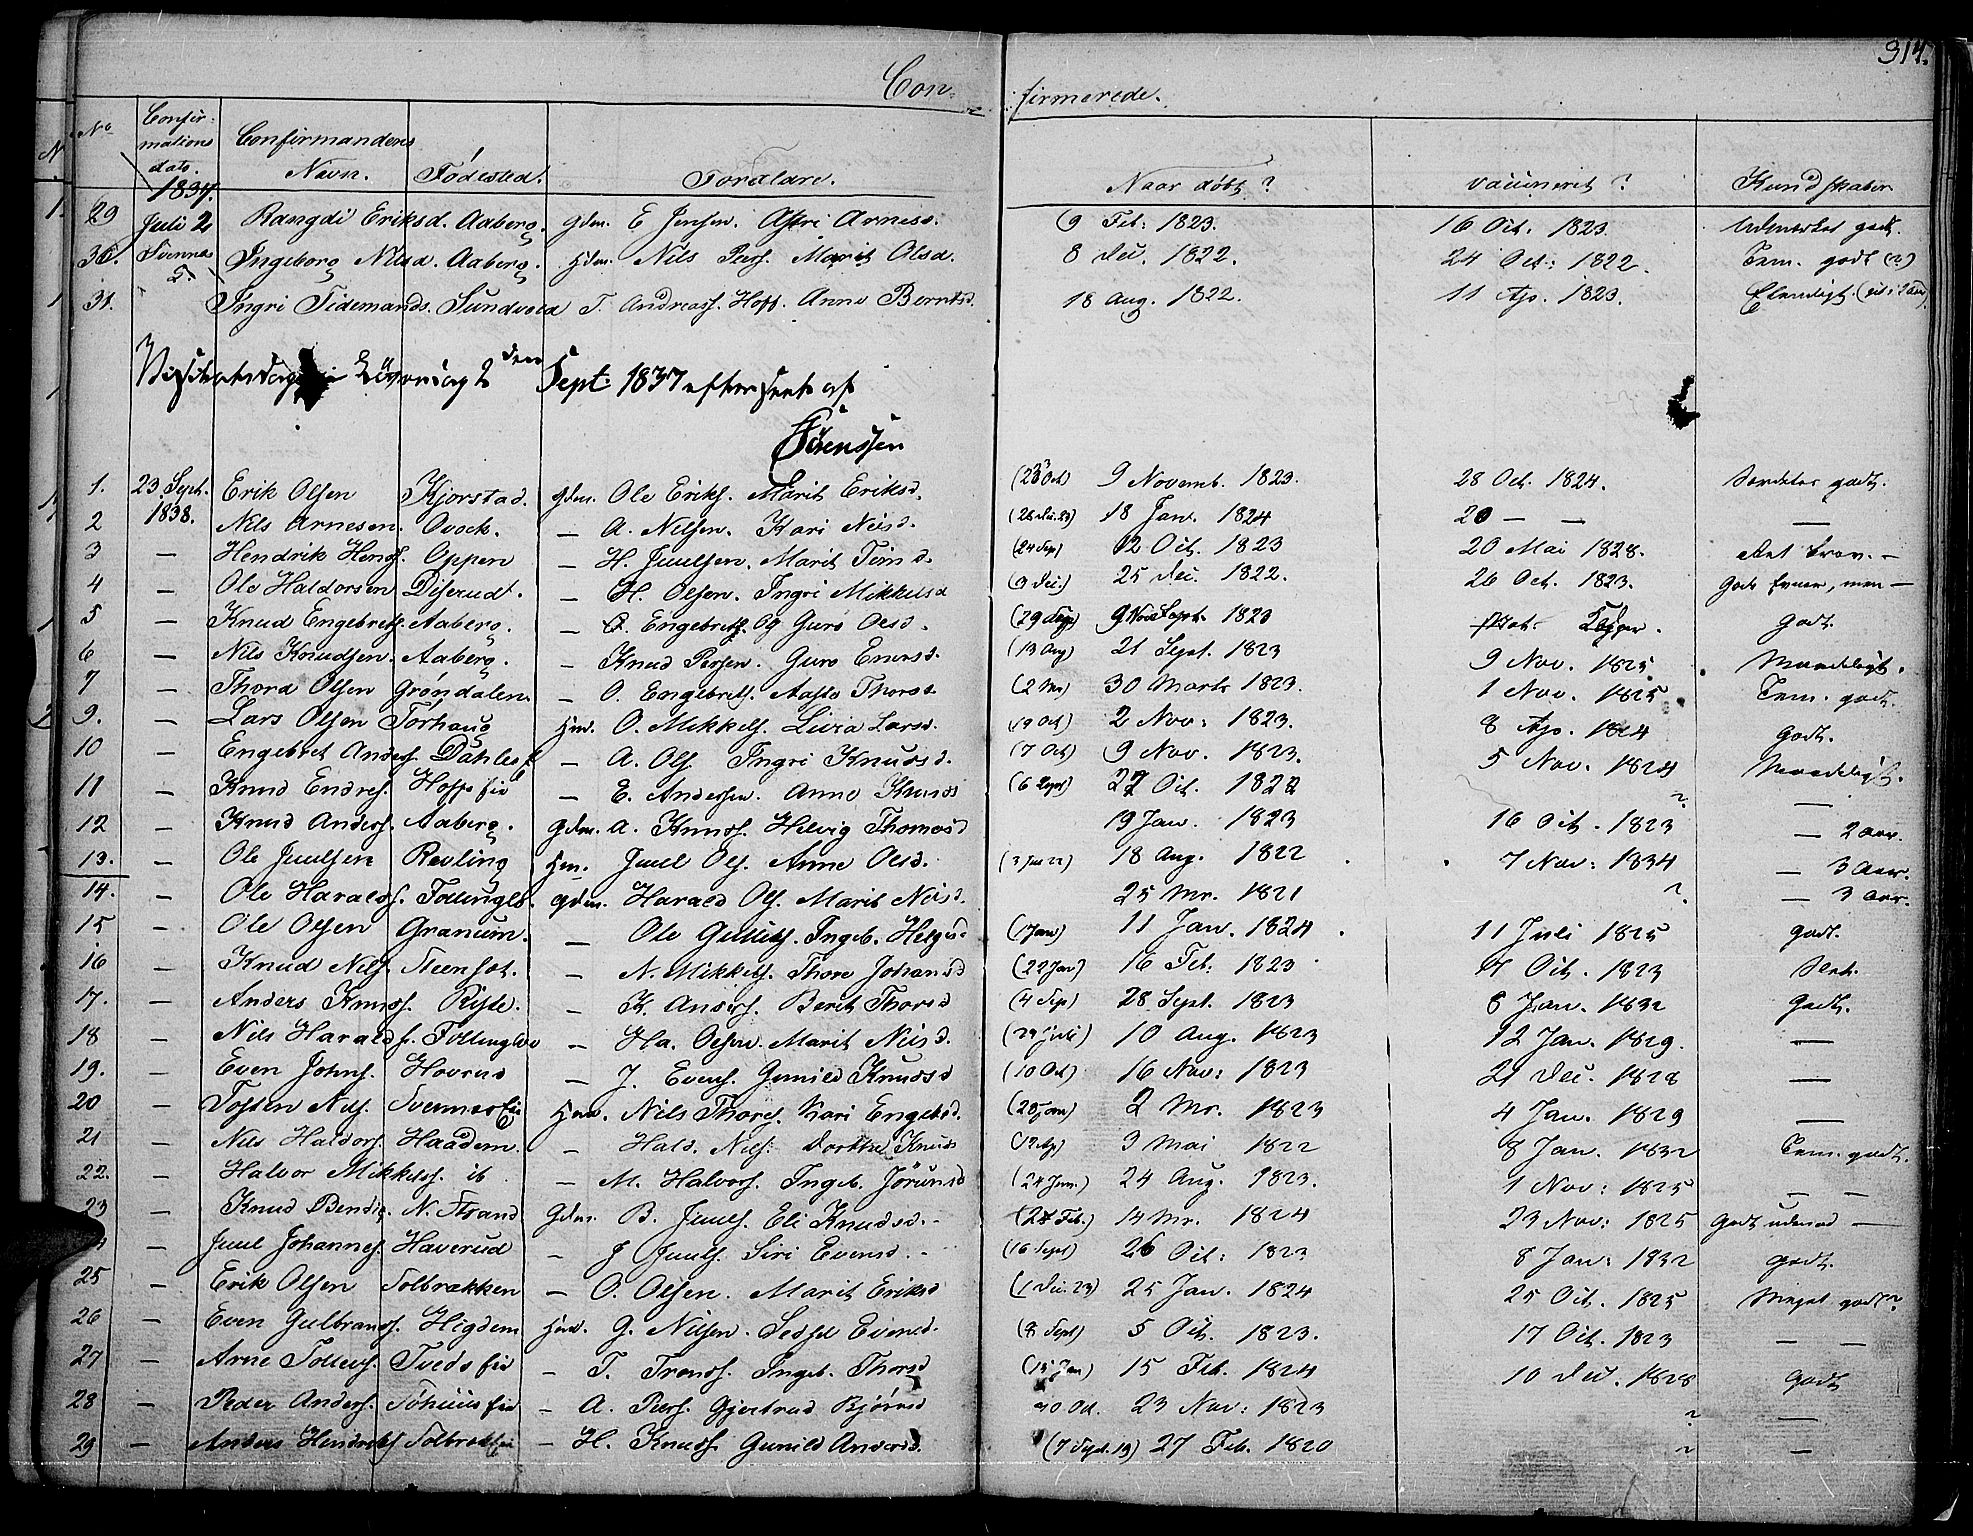 SAH, Nord-Aurdal prestekontor, Ministerialbok nr. 3, 1828-1841, s. 314